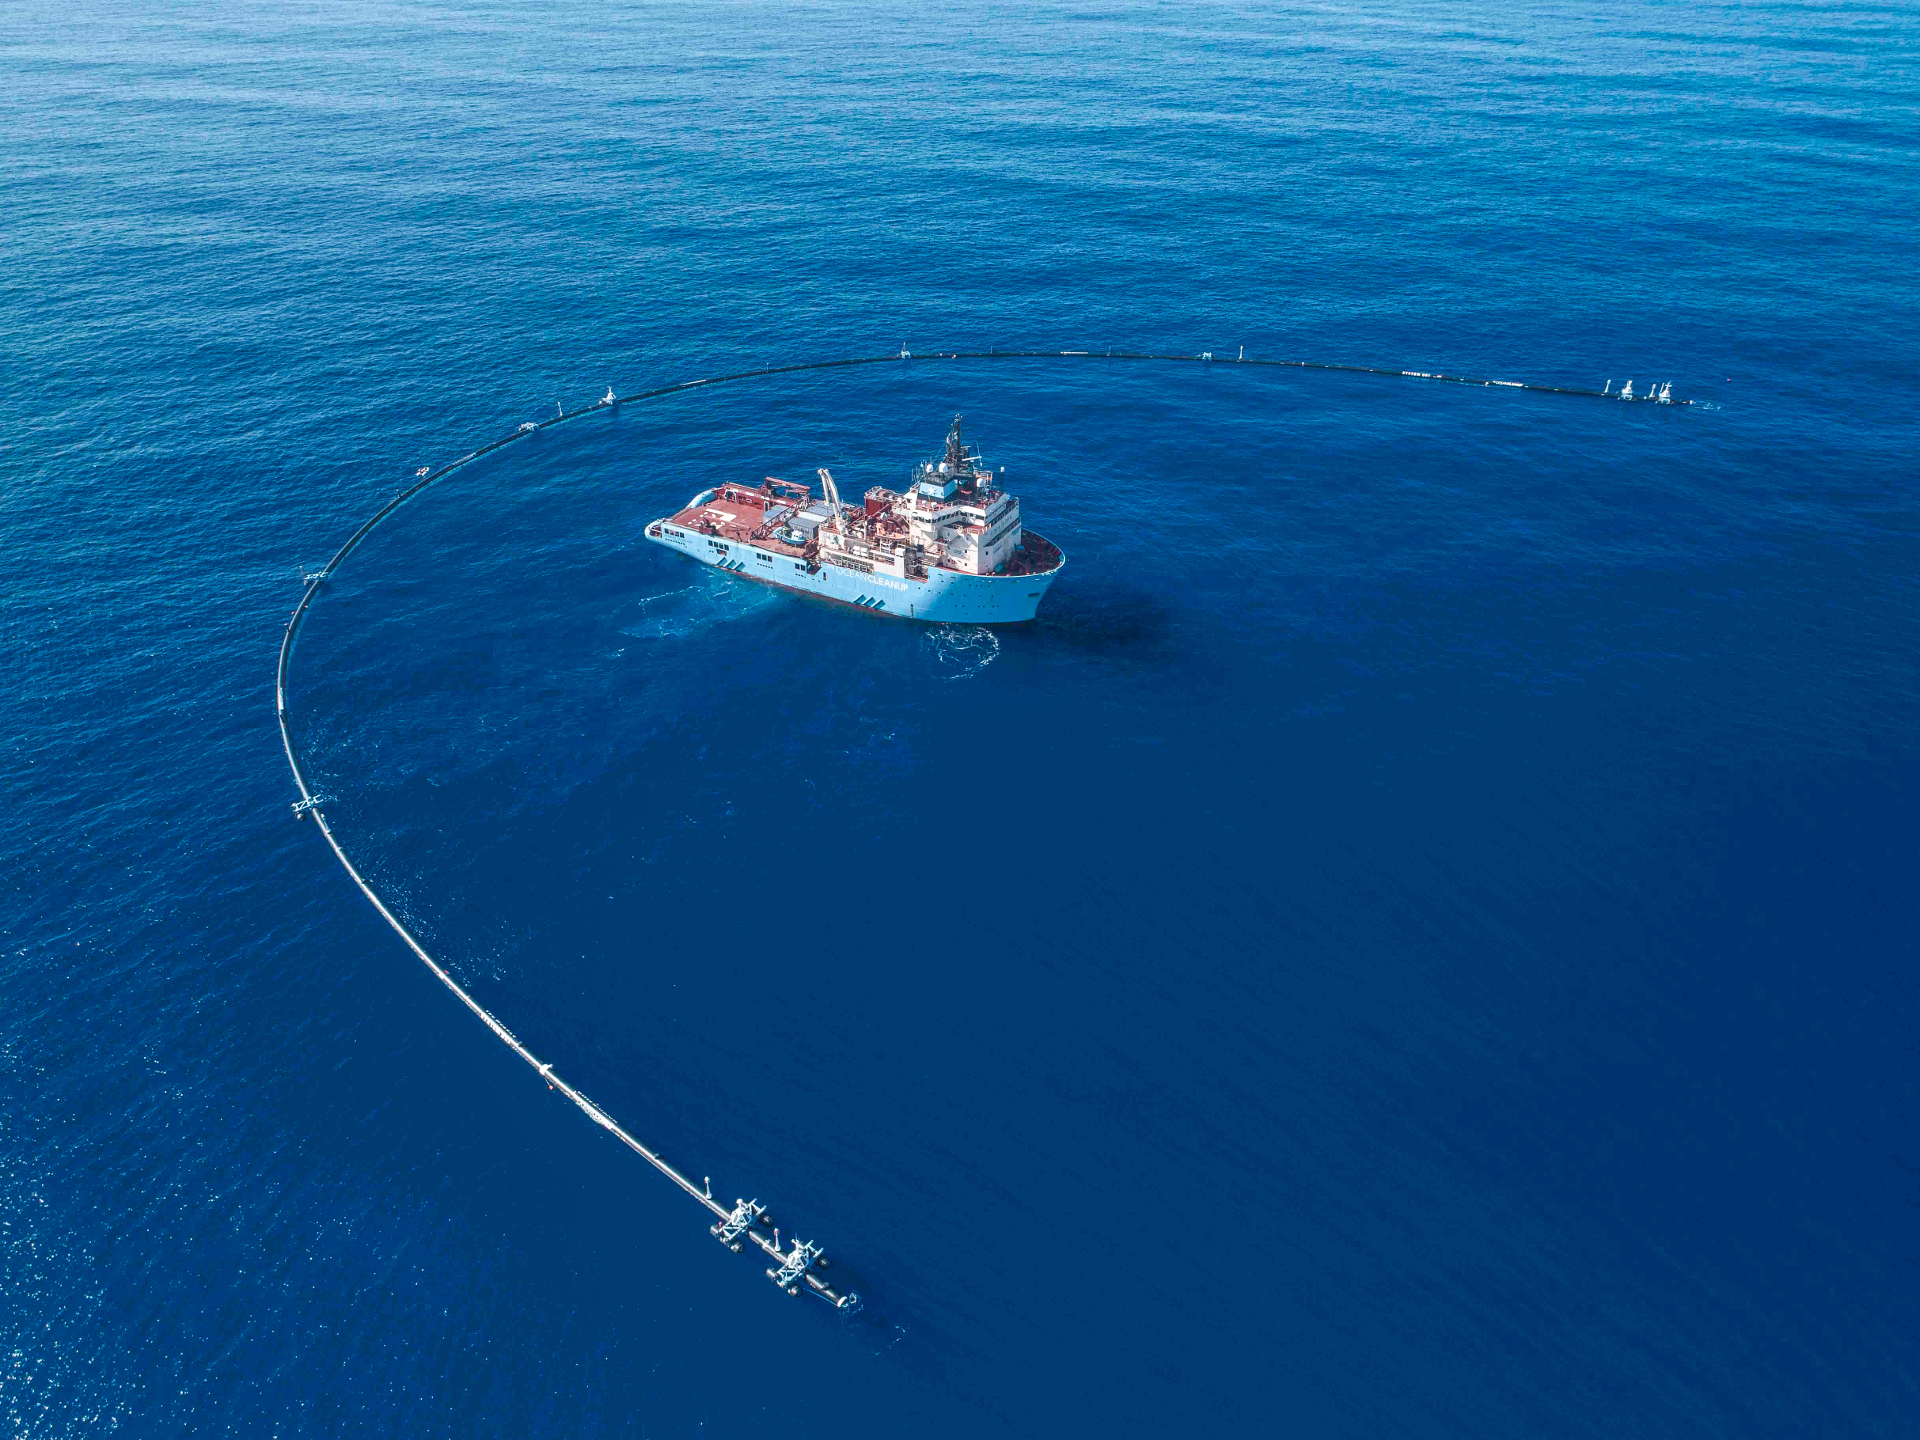 Das erste Plastikmüll Einfangsystem im Pazifik. - Photocredit:theoceancleanup.com